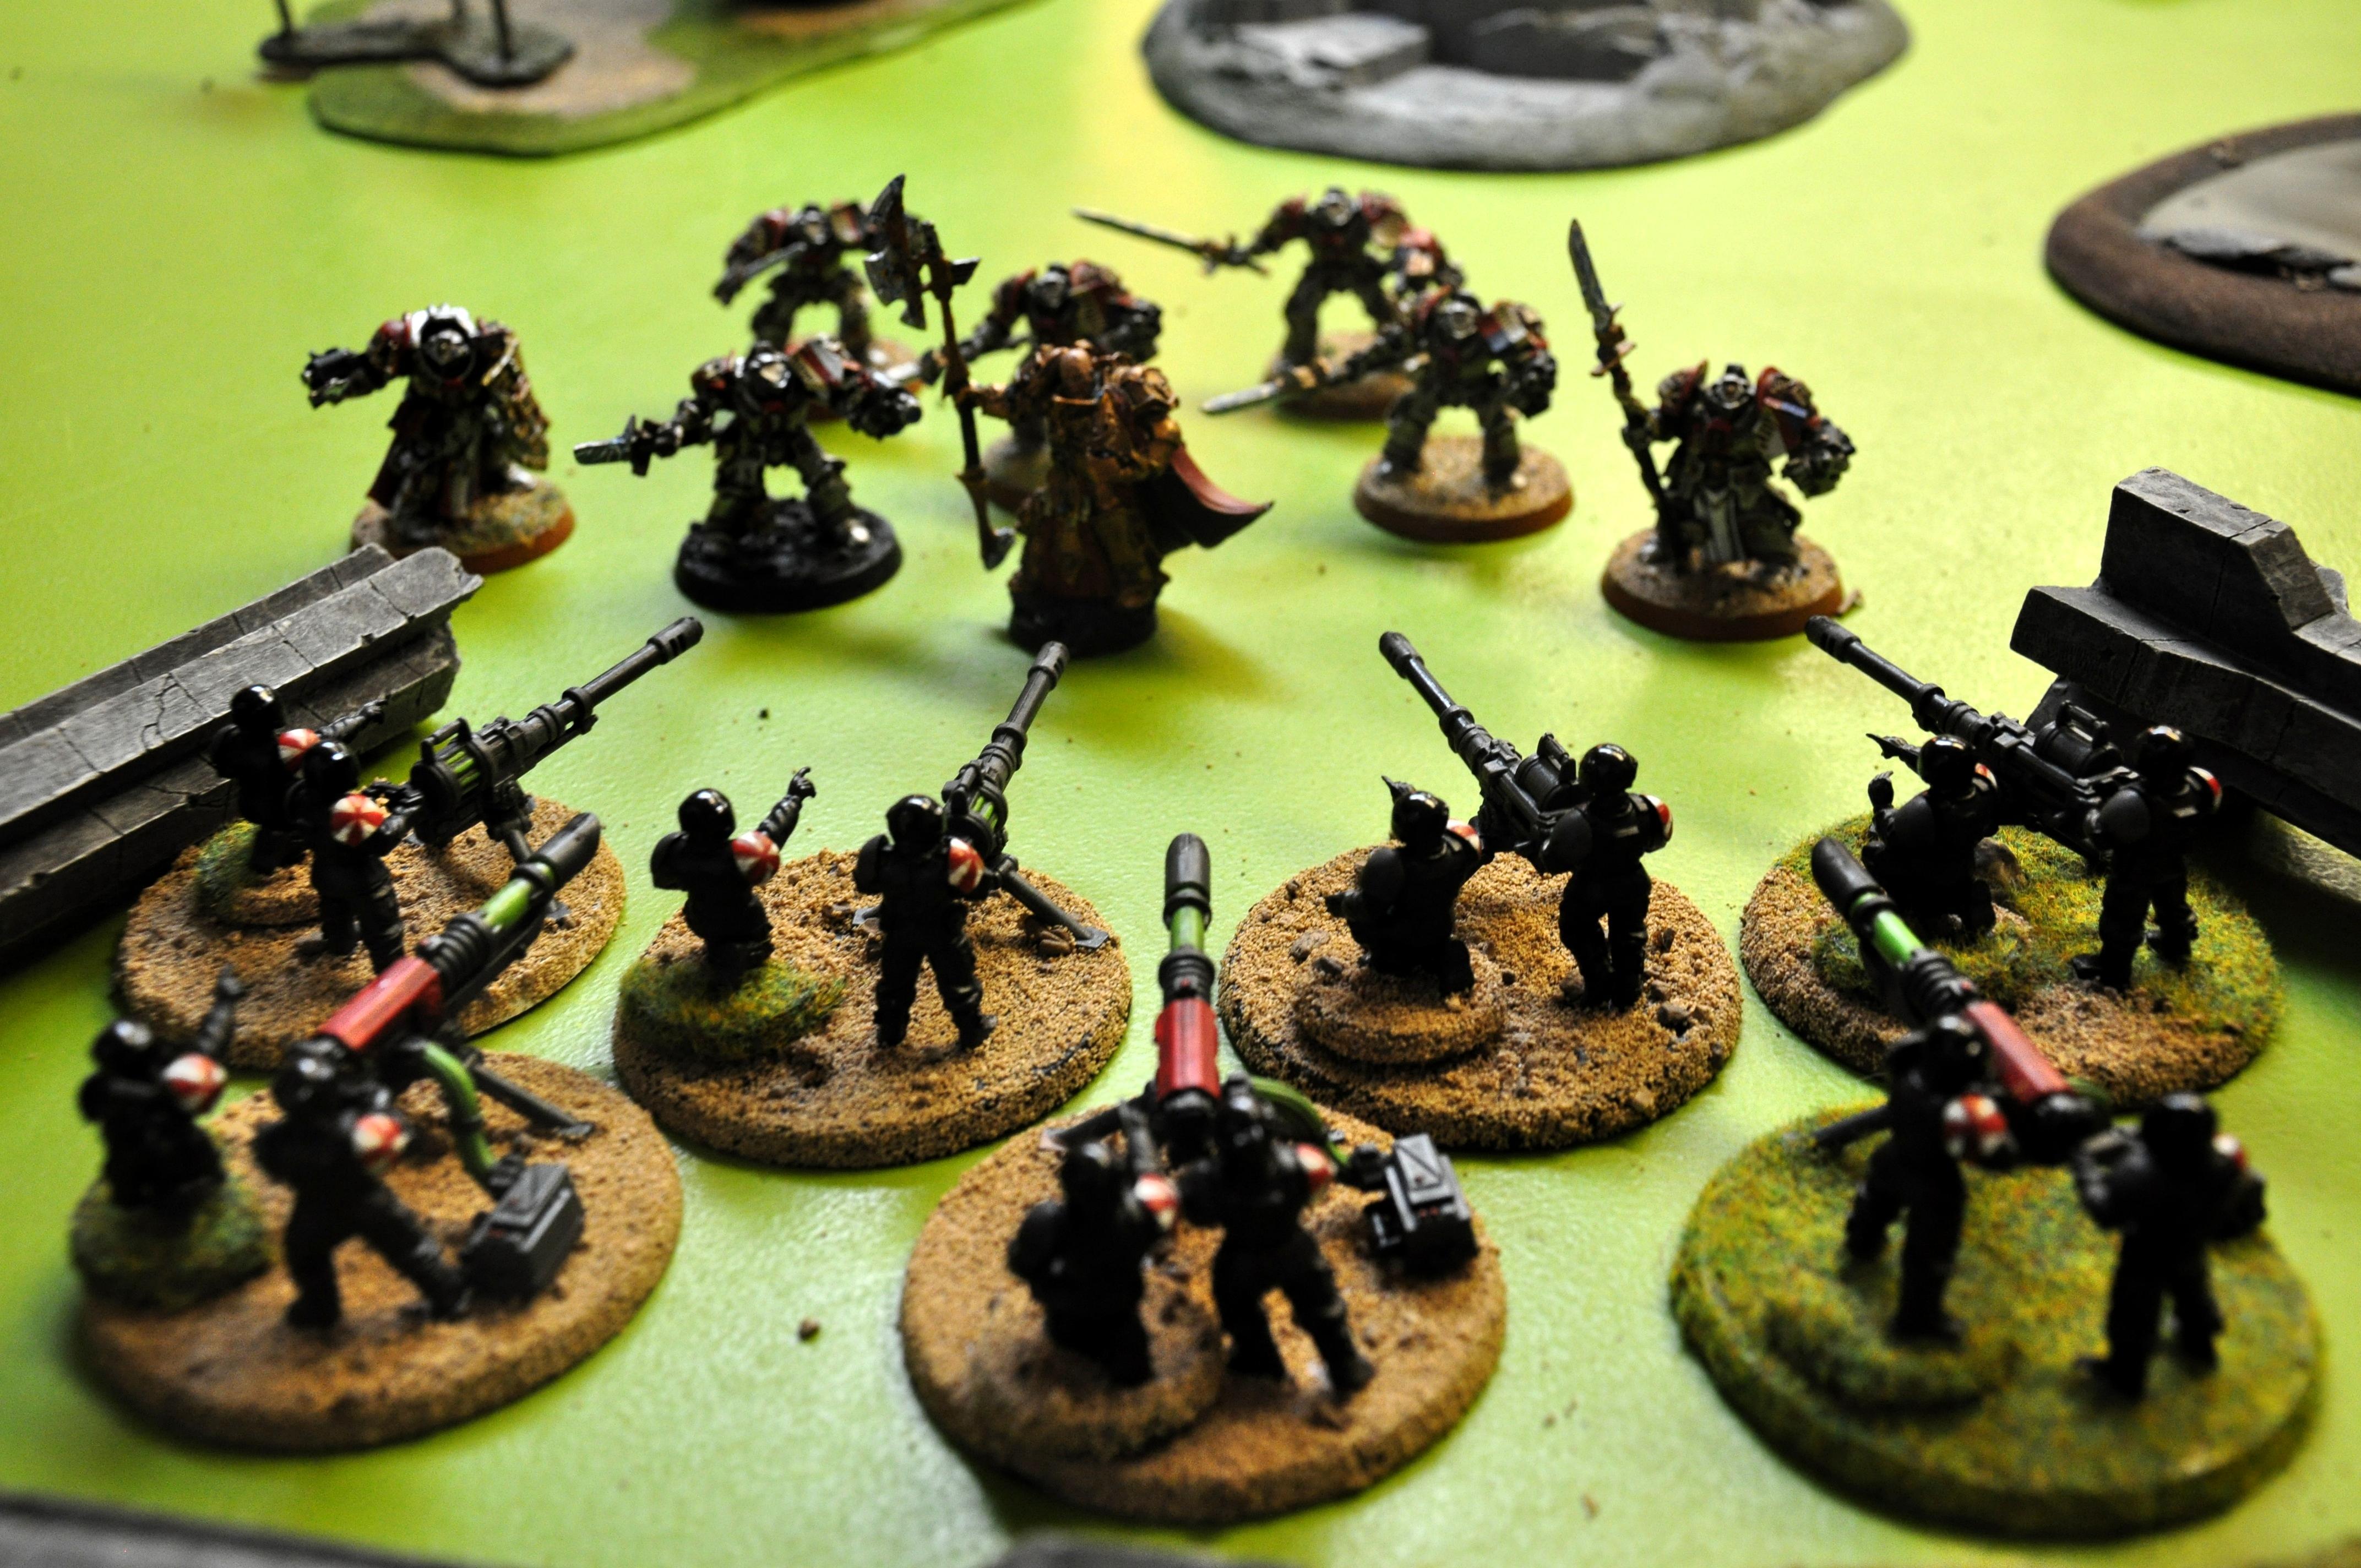 Apocalypse, Chaos, Death Guard, Dreadclaw, Guard, Heavy Weapons Team, Hwt, Imperial Guard, Medusa, Ogryns, Plague Marines, Reaver, Renegade, Resident Evil, Titan, Traitor, Umbrella, Zombie